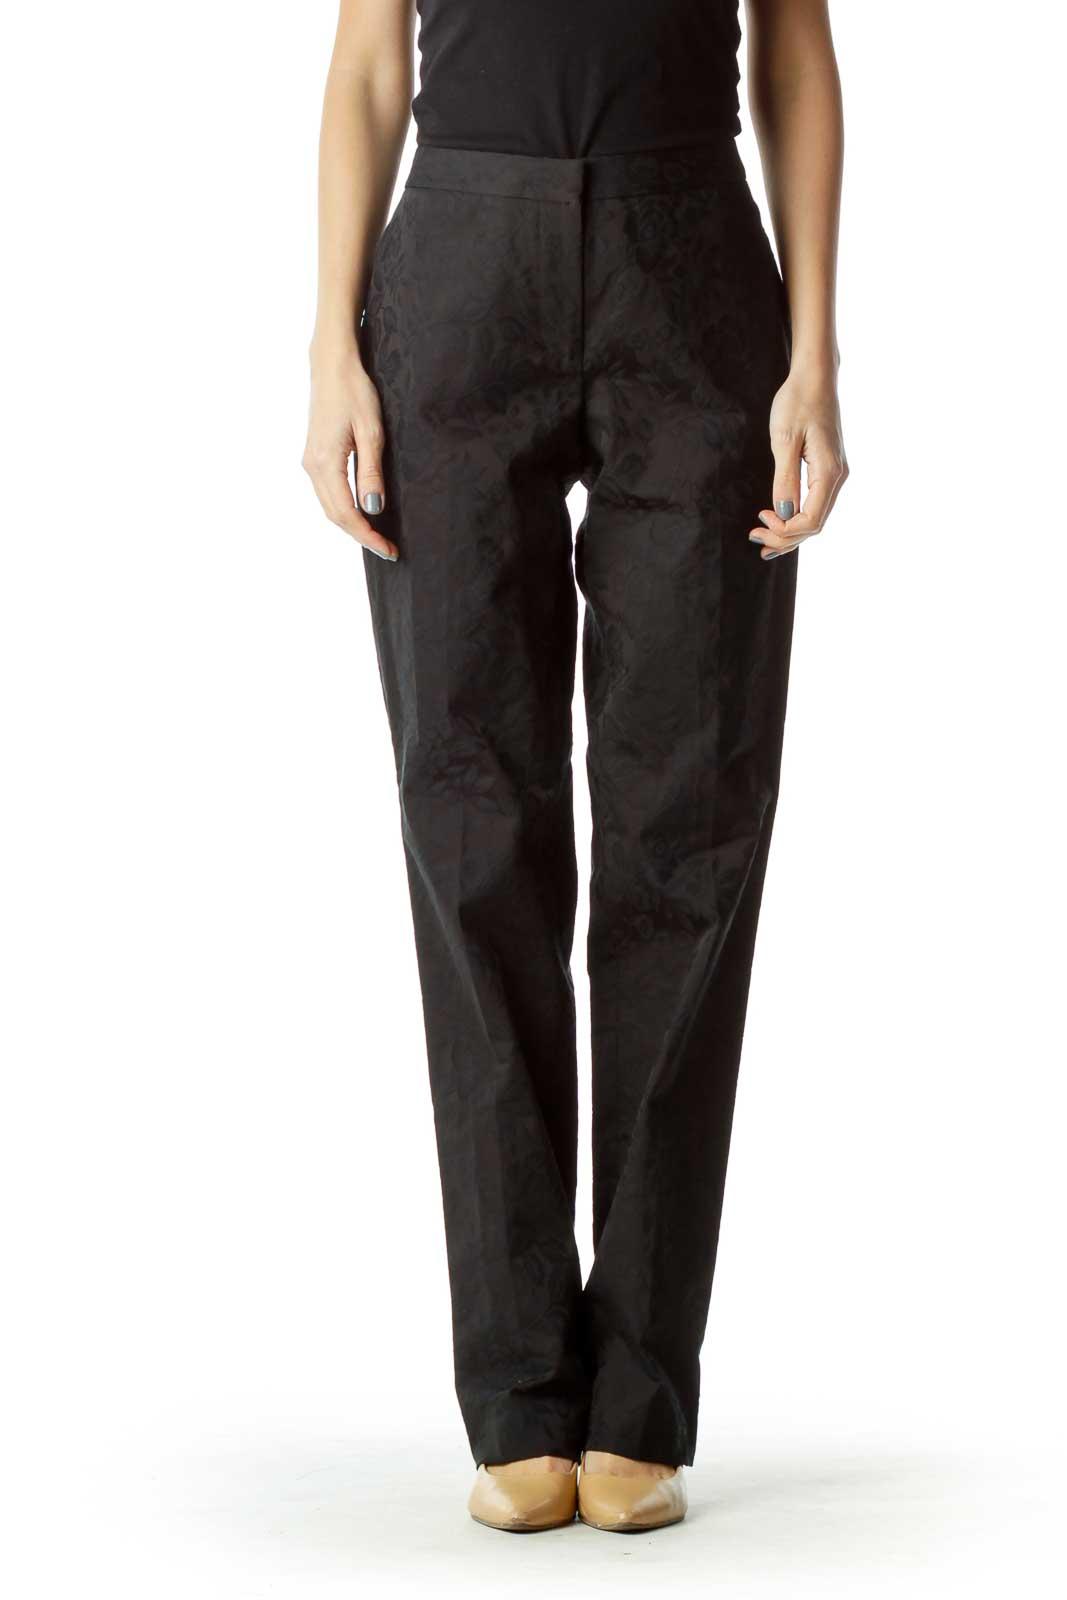 Black Floral Embossed Pants Front